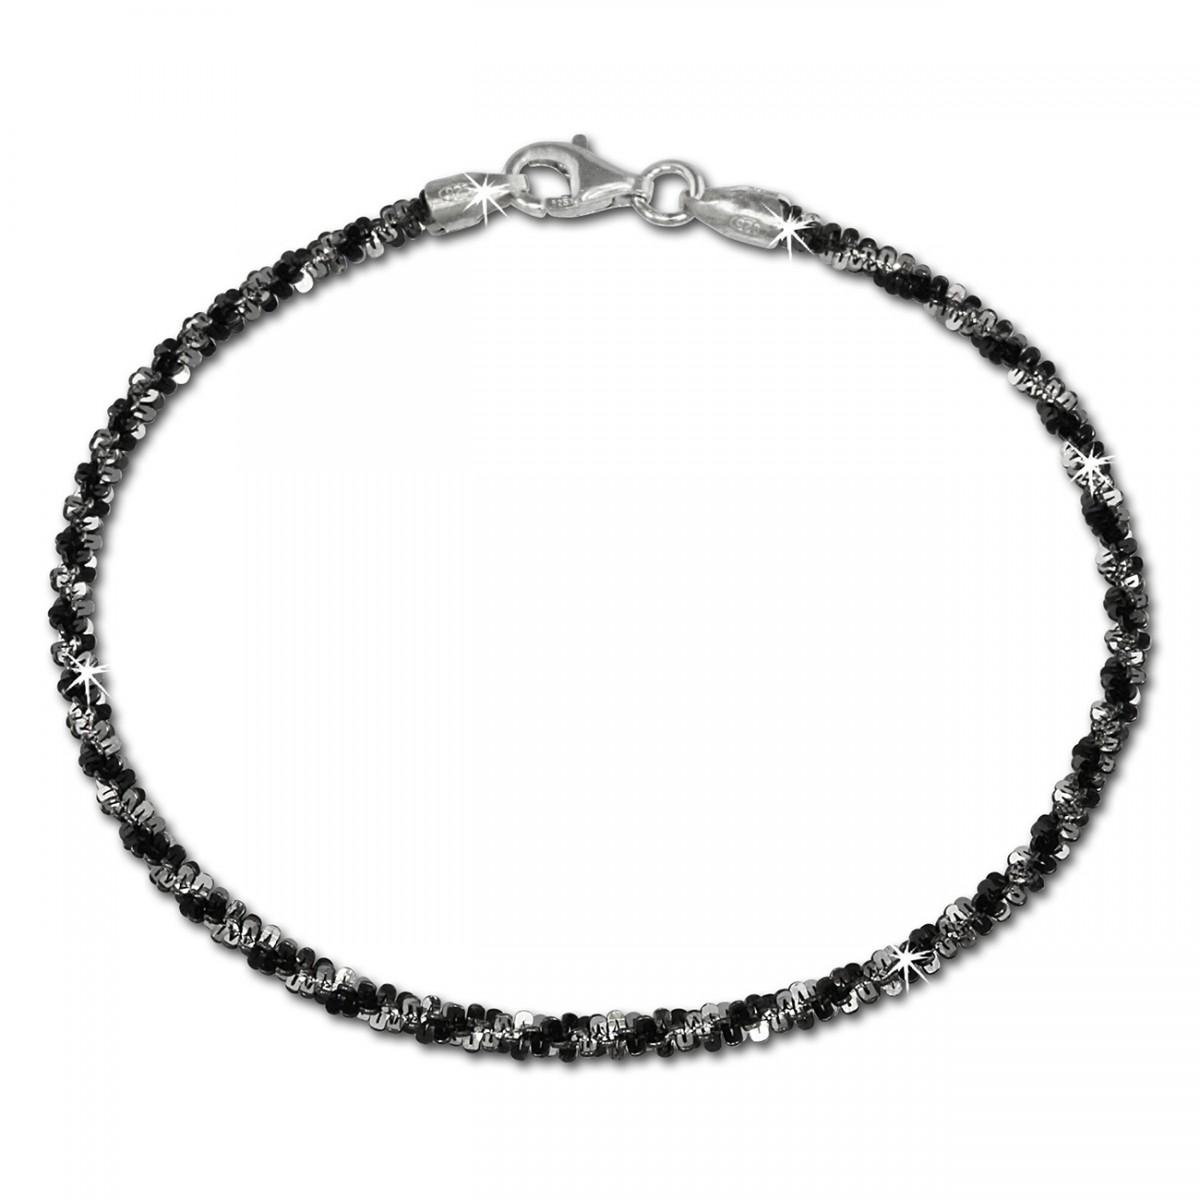 silberdream armband gedreht schwarz 925 silber damen sda2039s. Black Bedroom Furniture Sets. Home Design Ideas